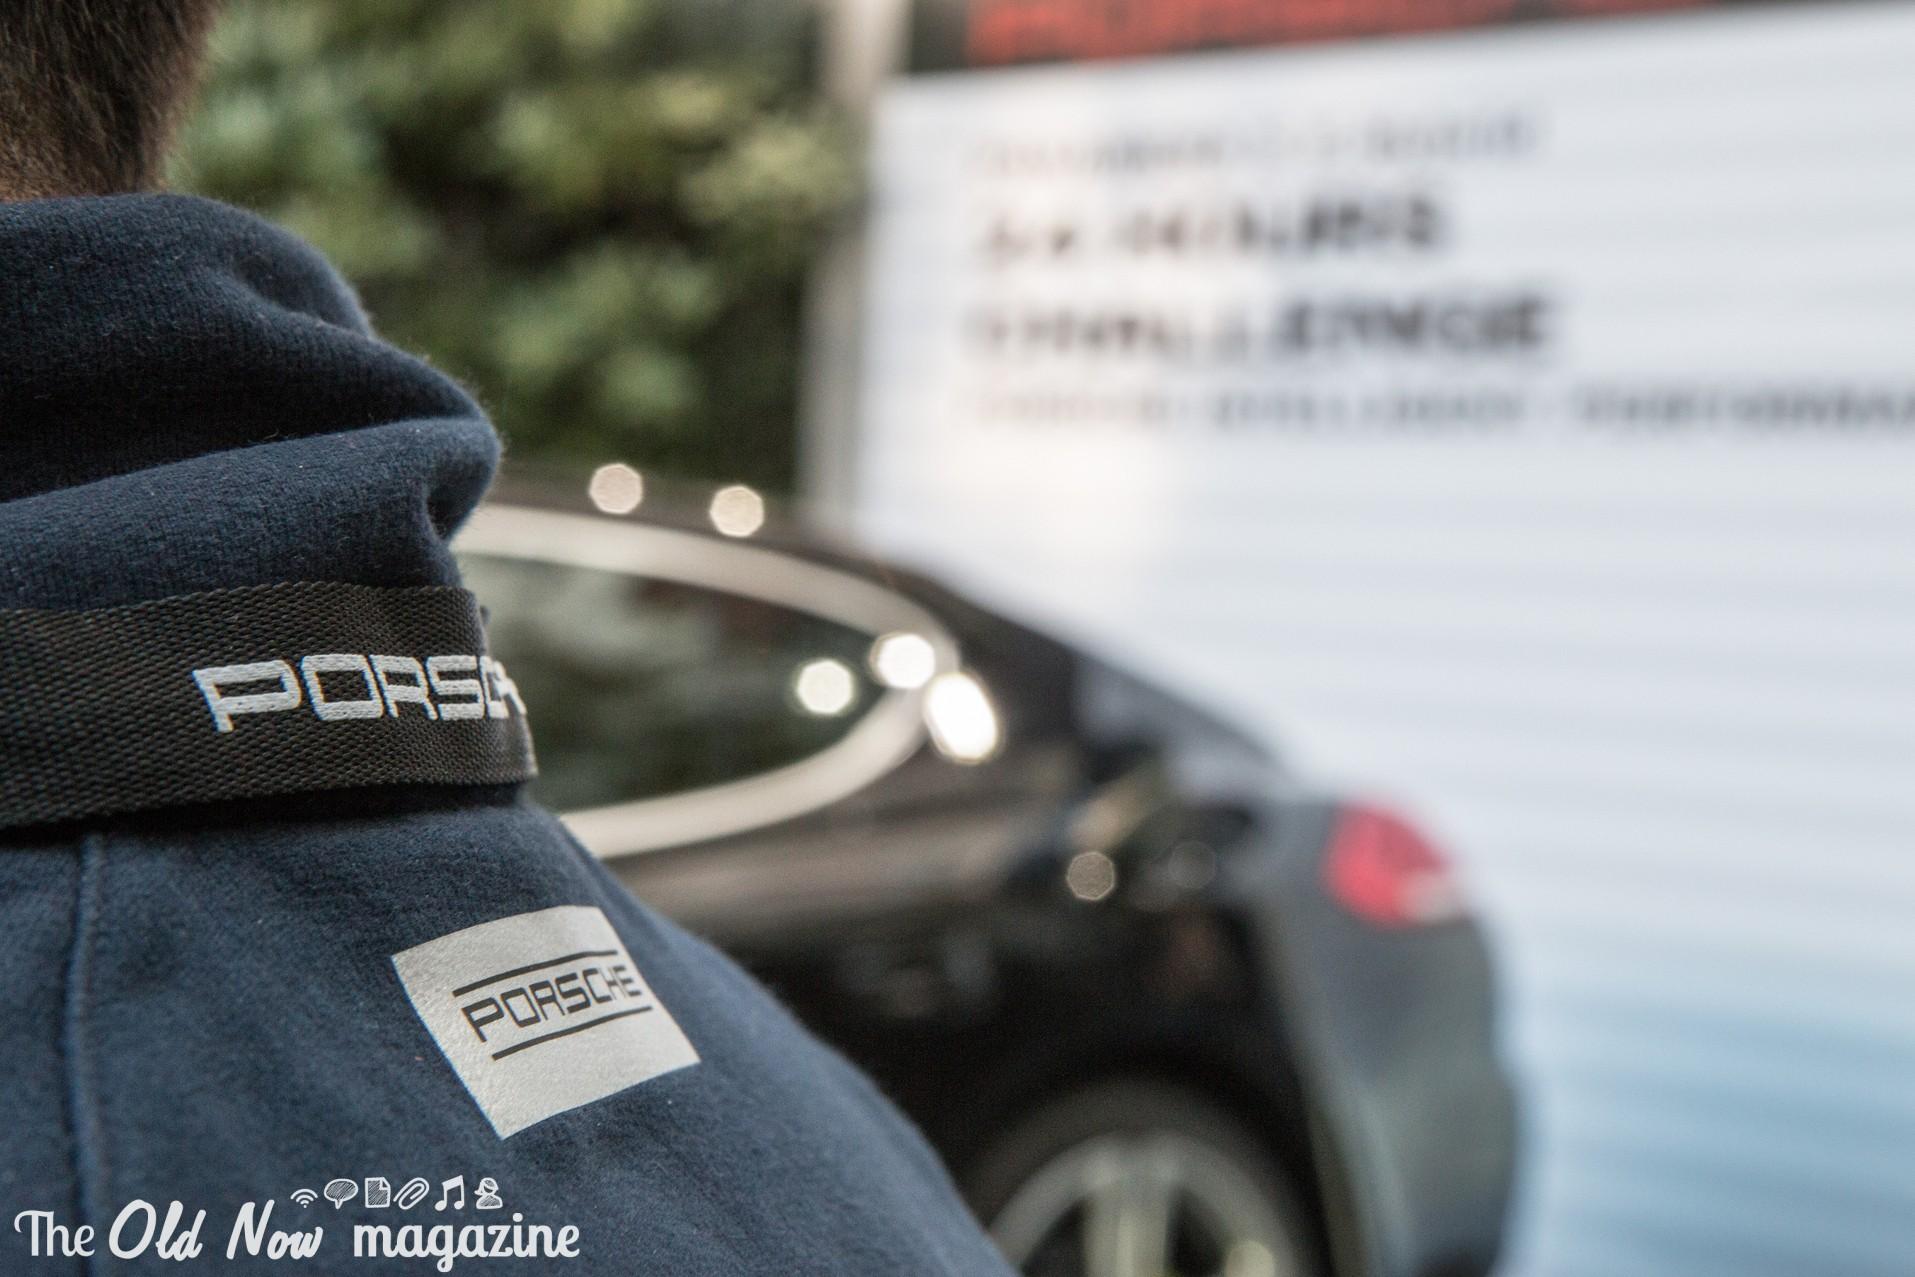 Porsche Panamera S e-hybrid (5)